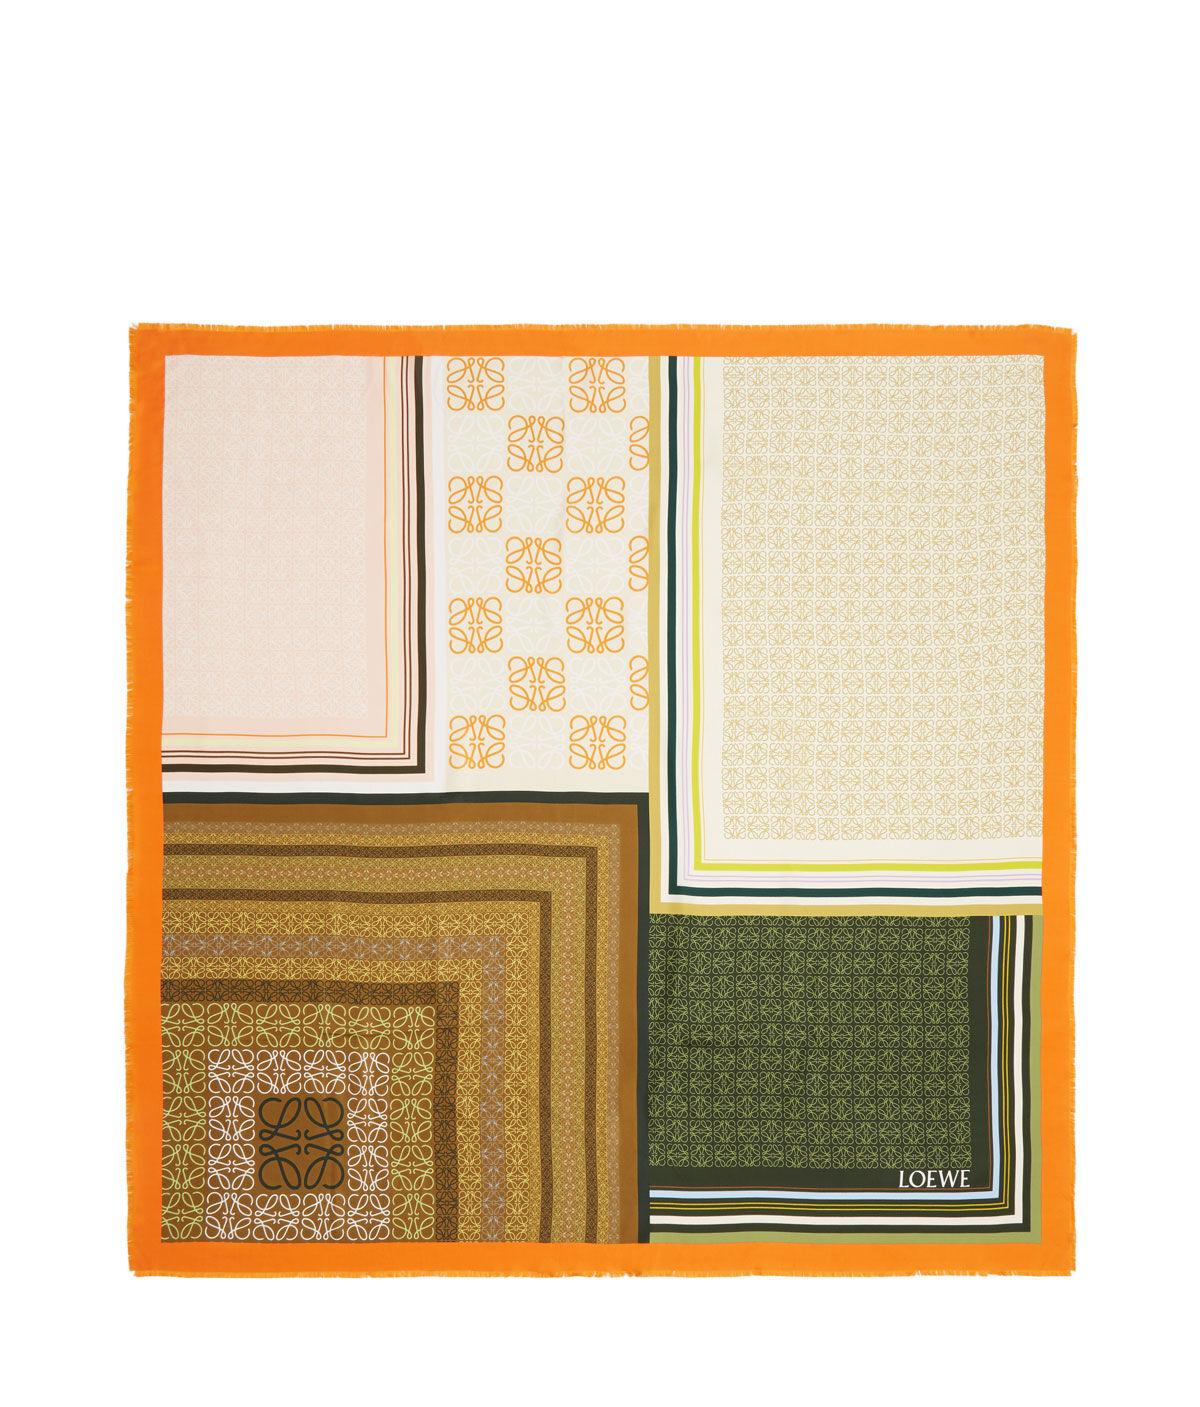 LOEWE 140X140 Scarf Print Patchwork Naranja all